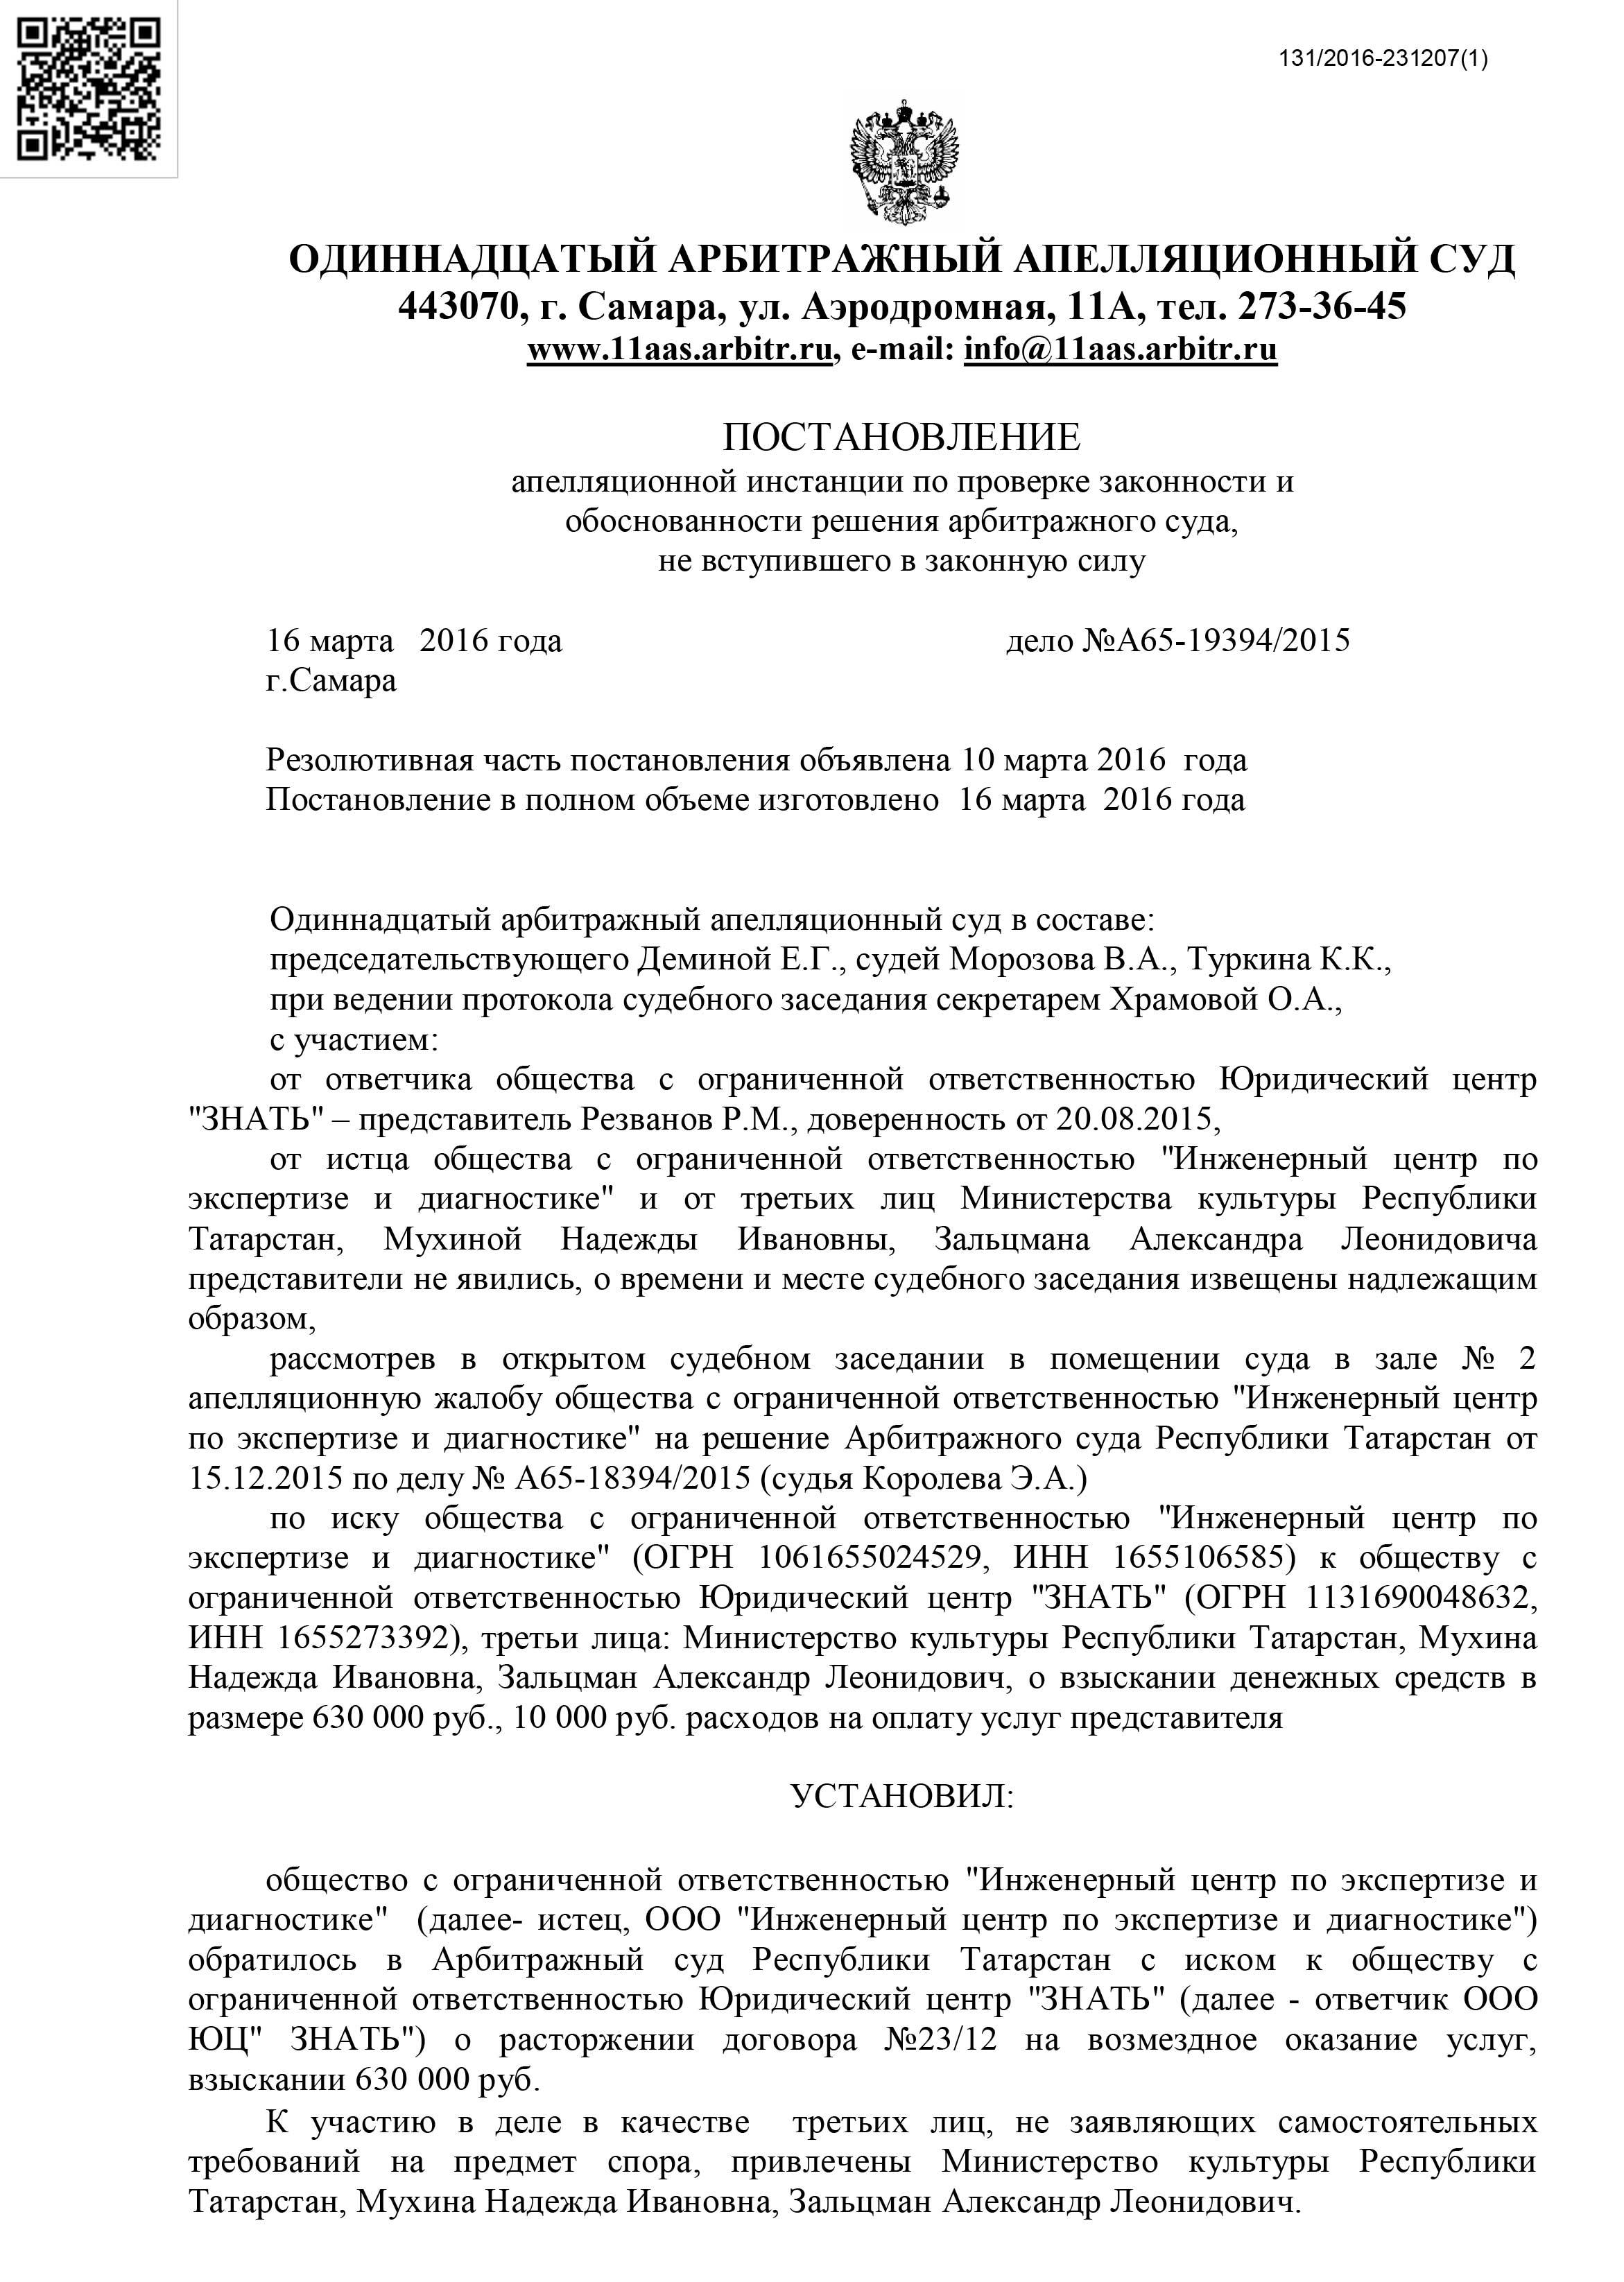 A65-18394-2015_20160316_Postanovlenie_apelljacionnoj_instancii-1